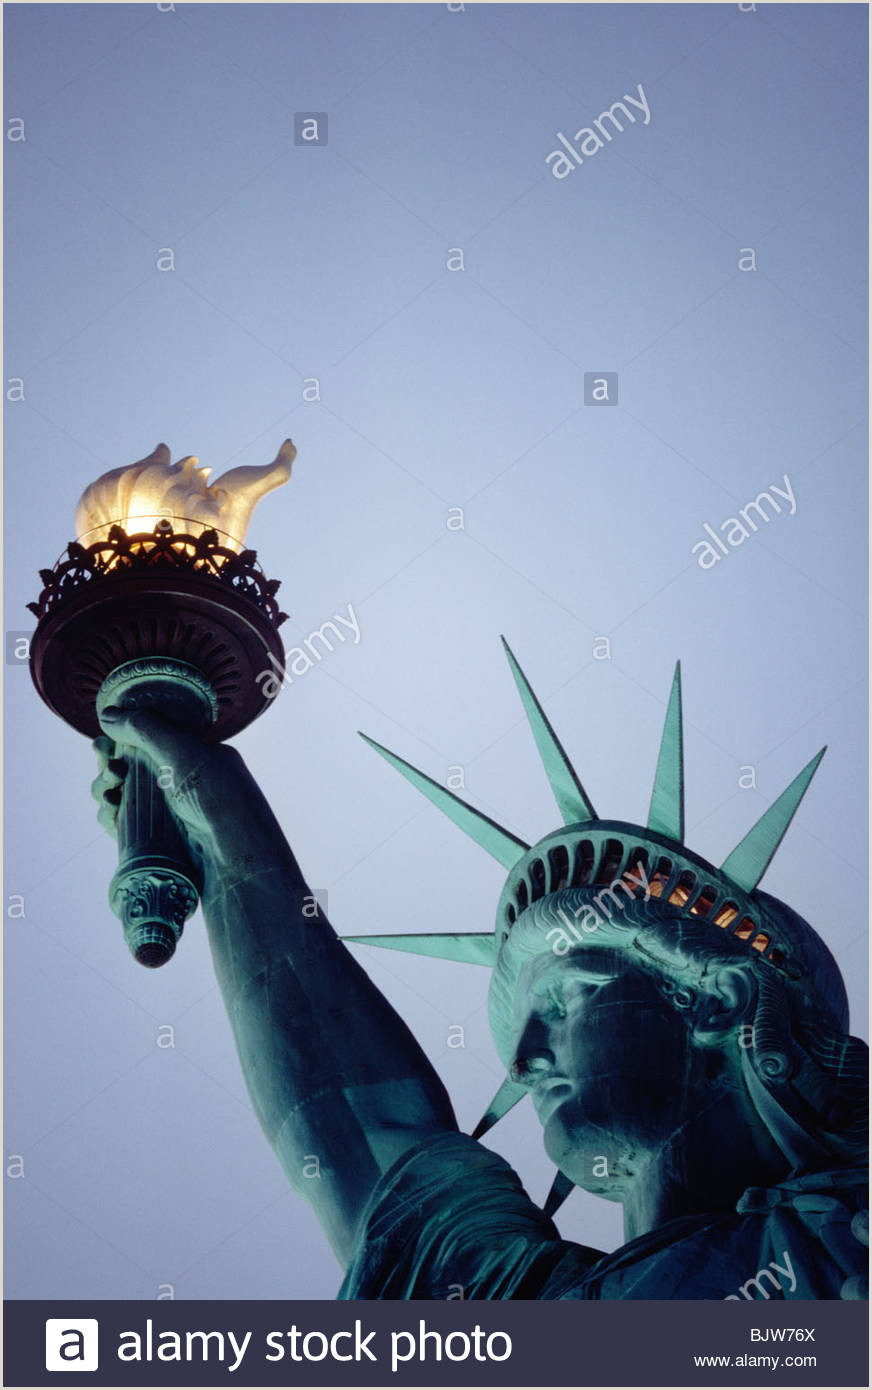 Liberty Spikes s & Liberty Spikes Alamy